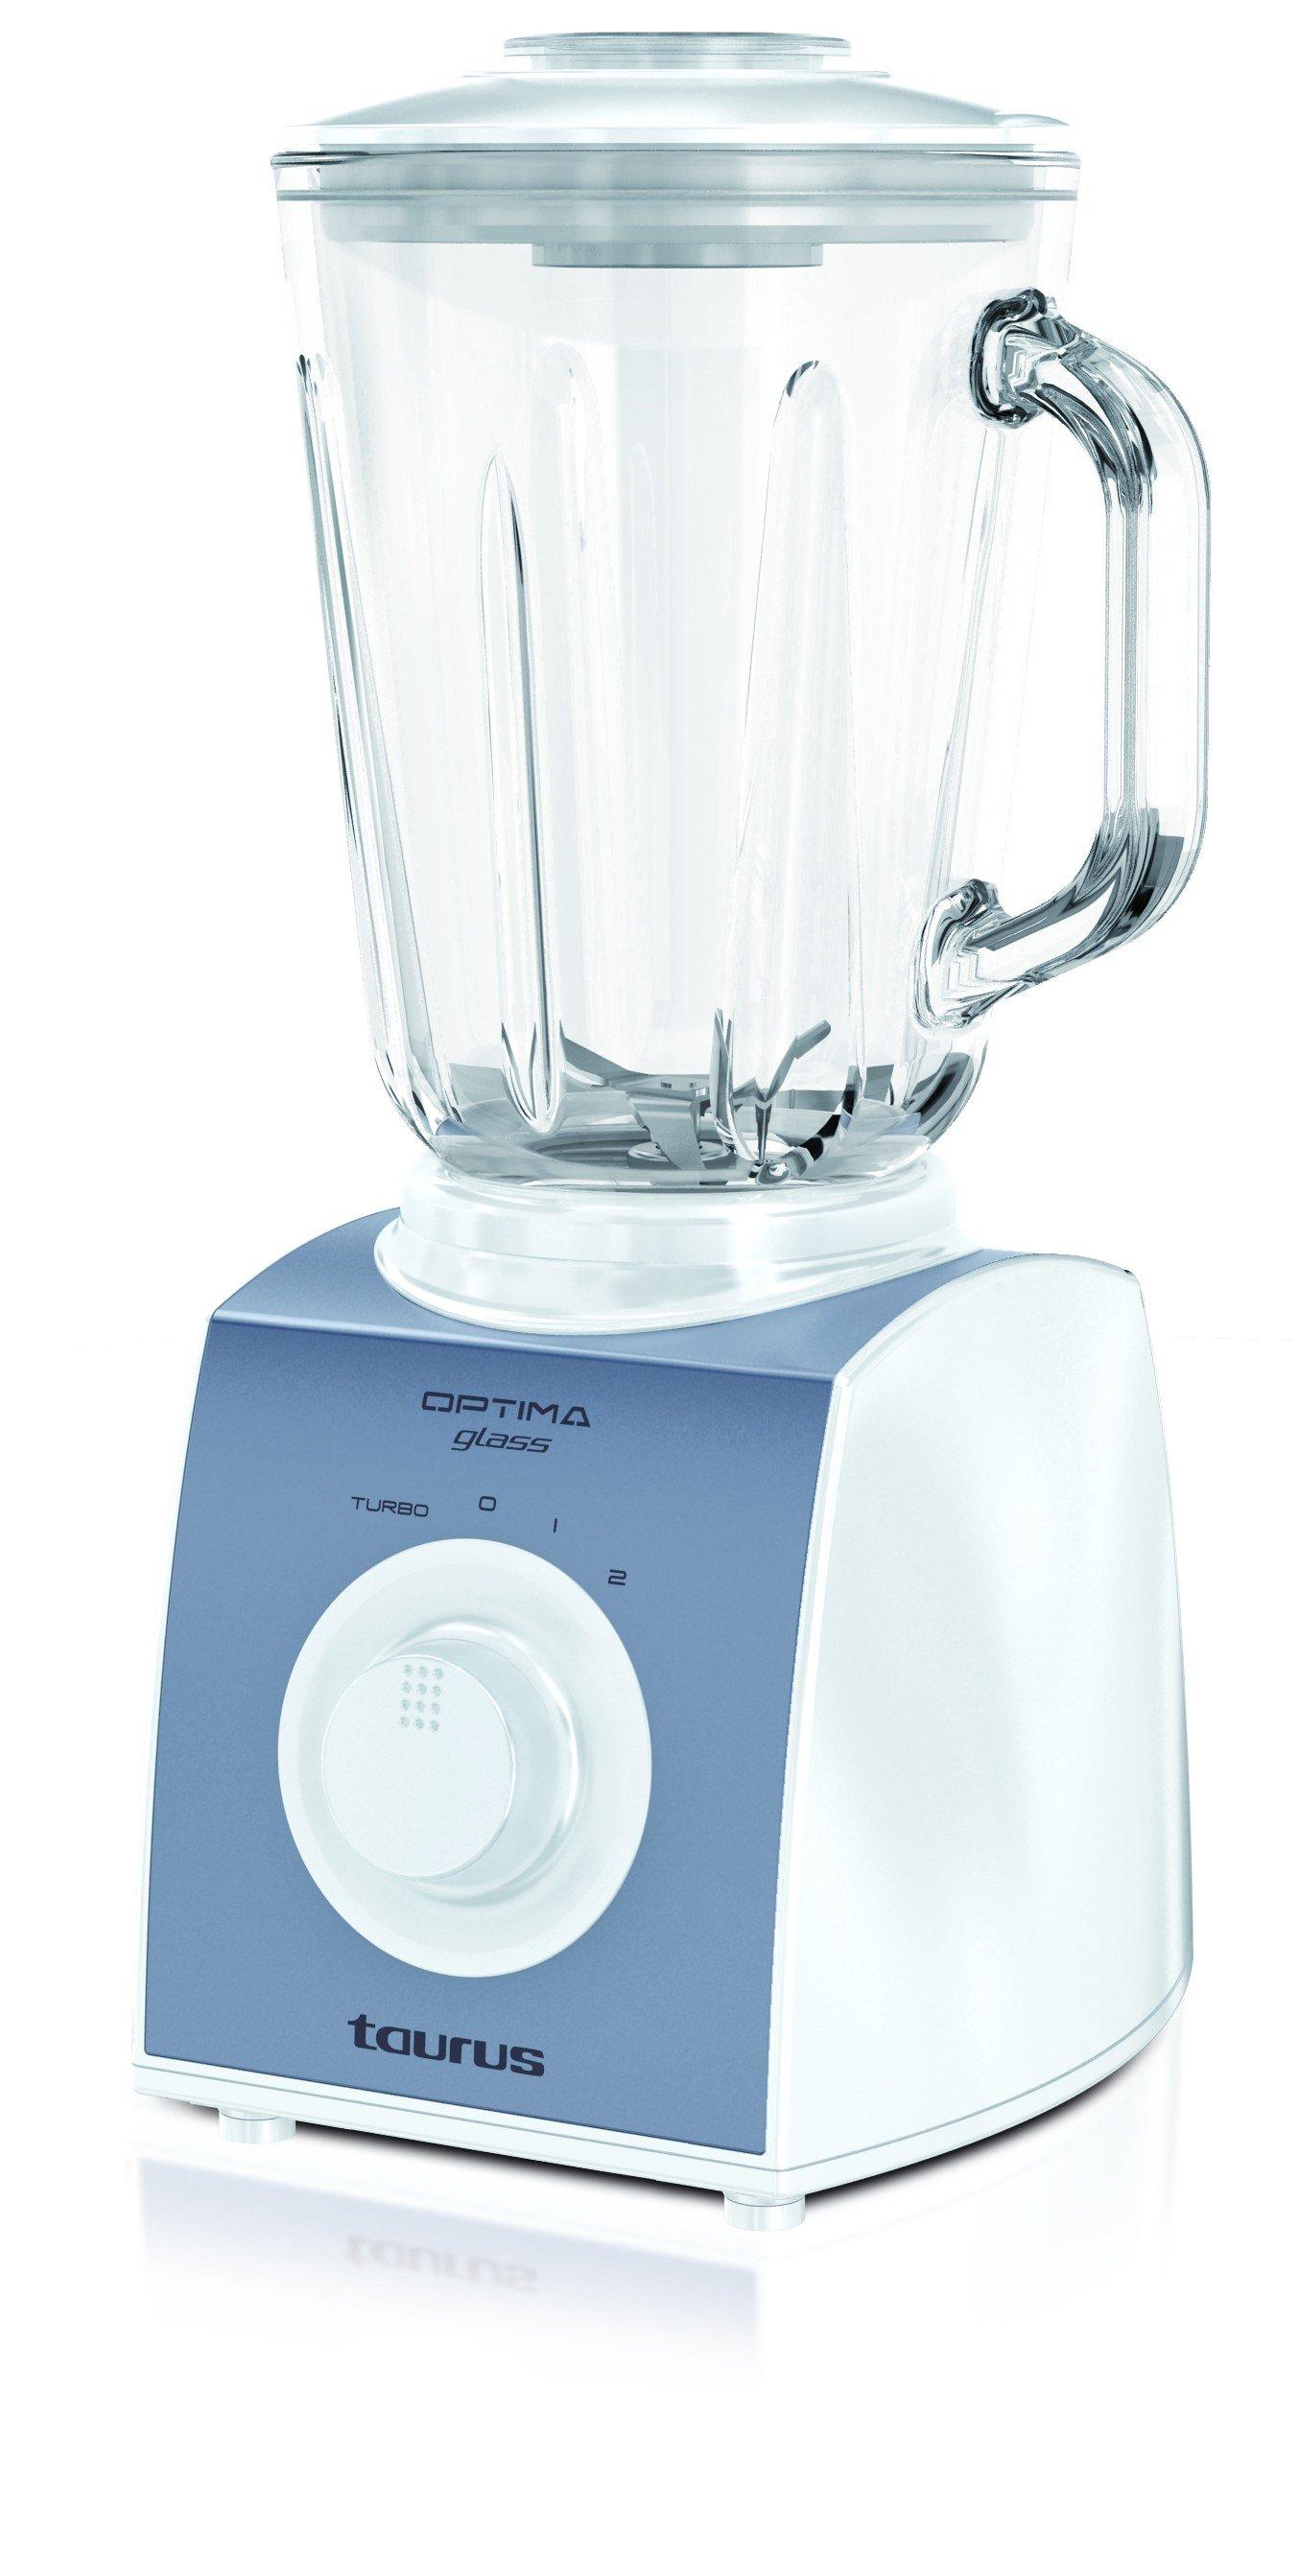 Batidora vaso taurus optima glass batidora taurus optima - Batidora de vaso worten ...